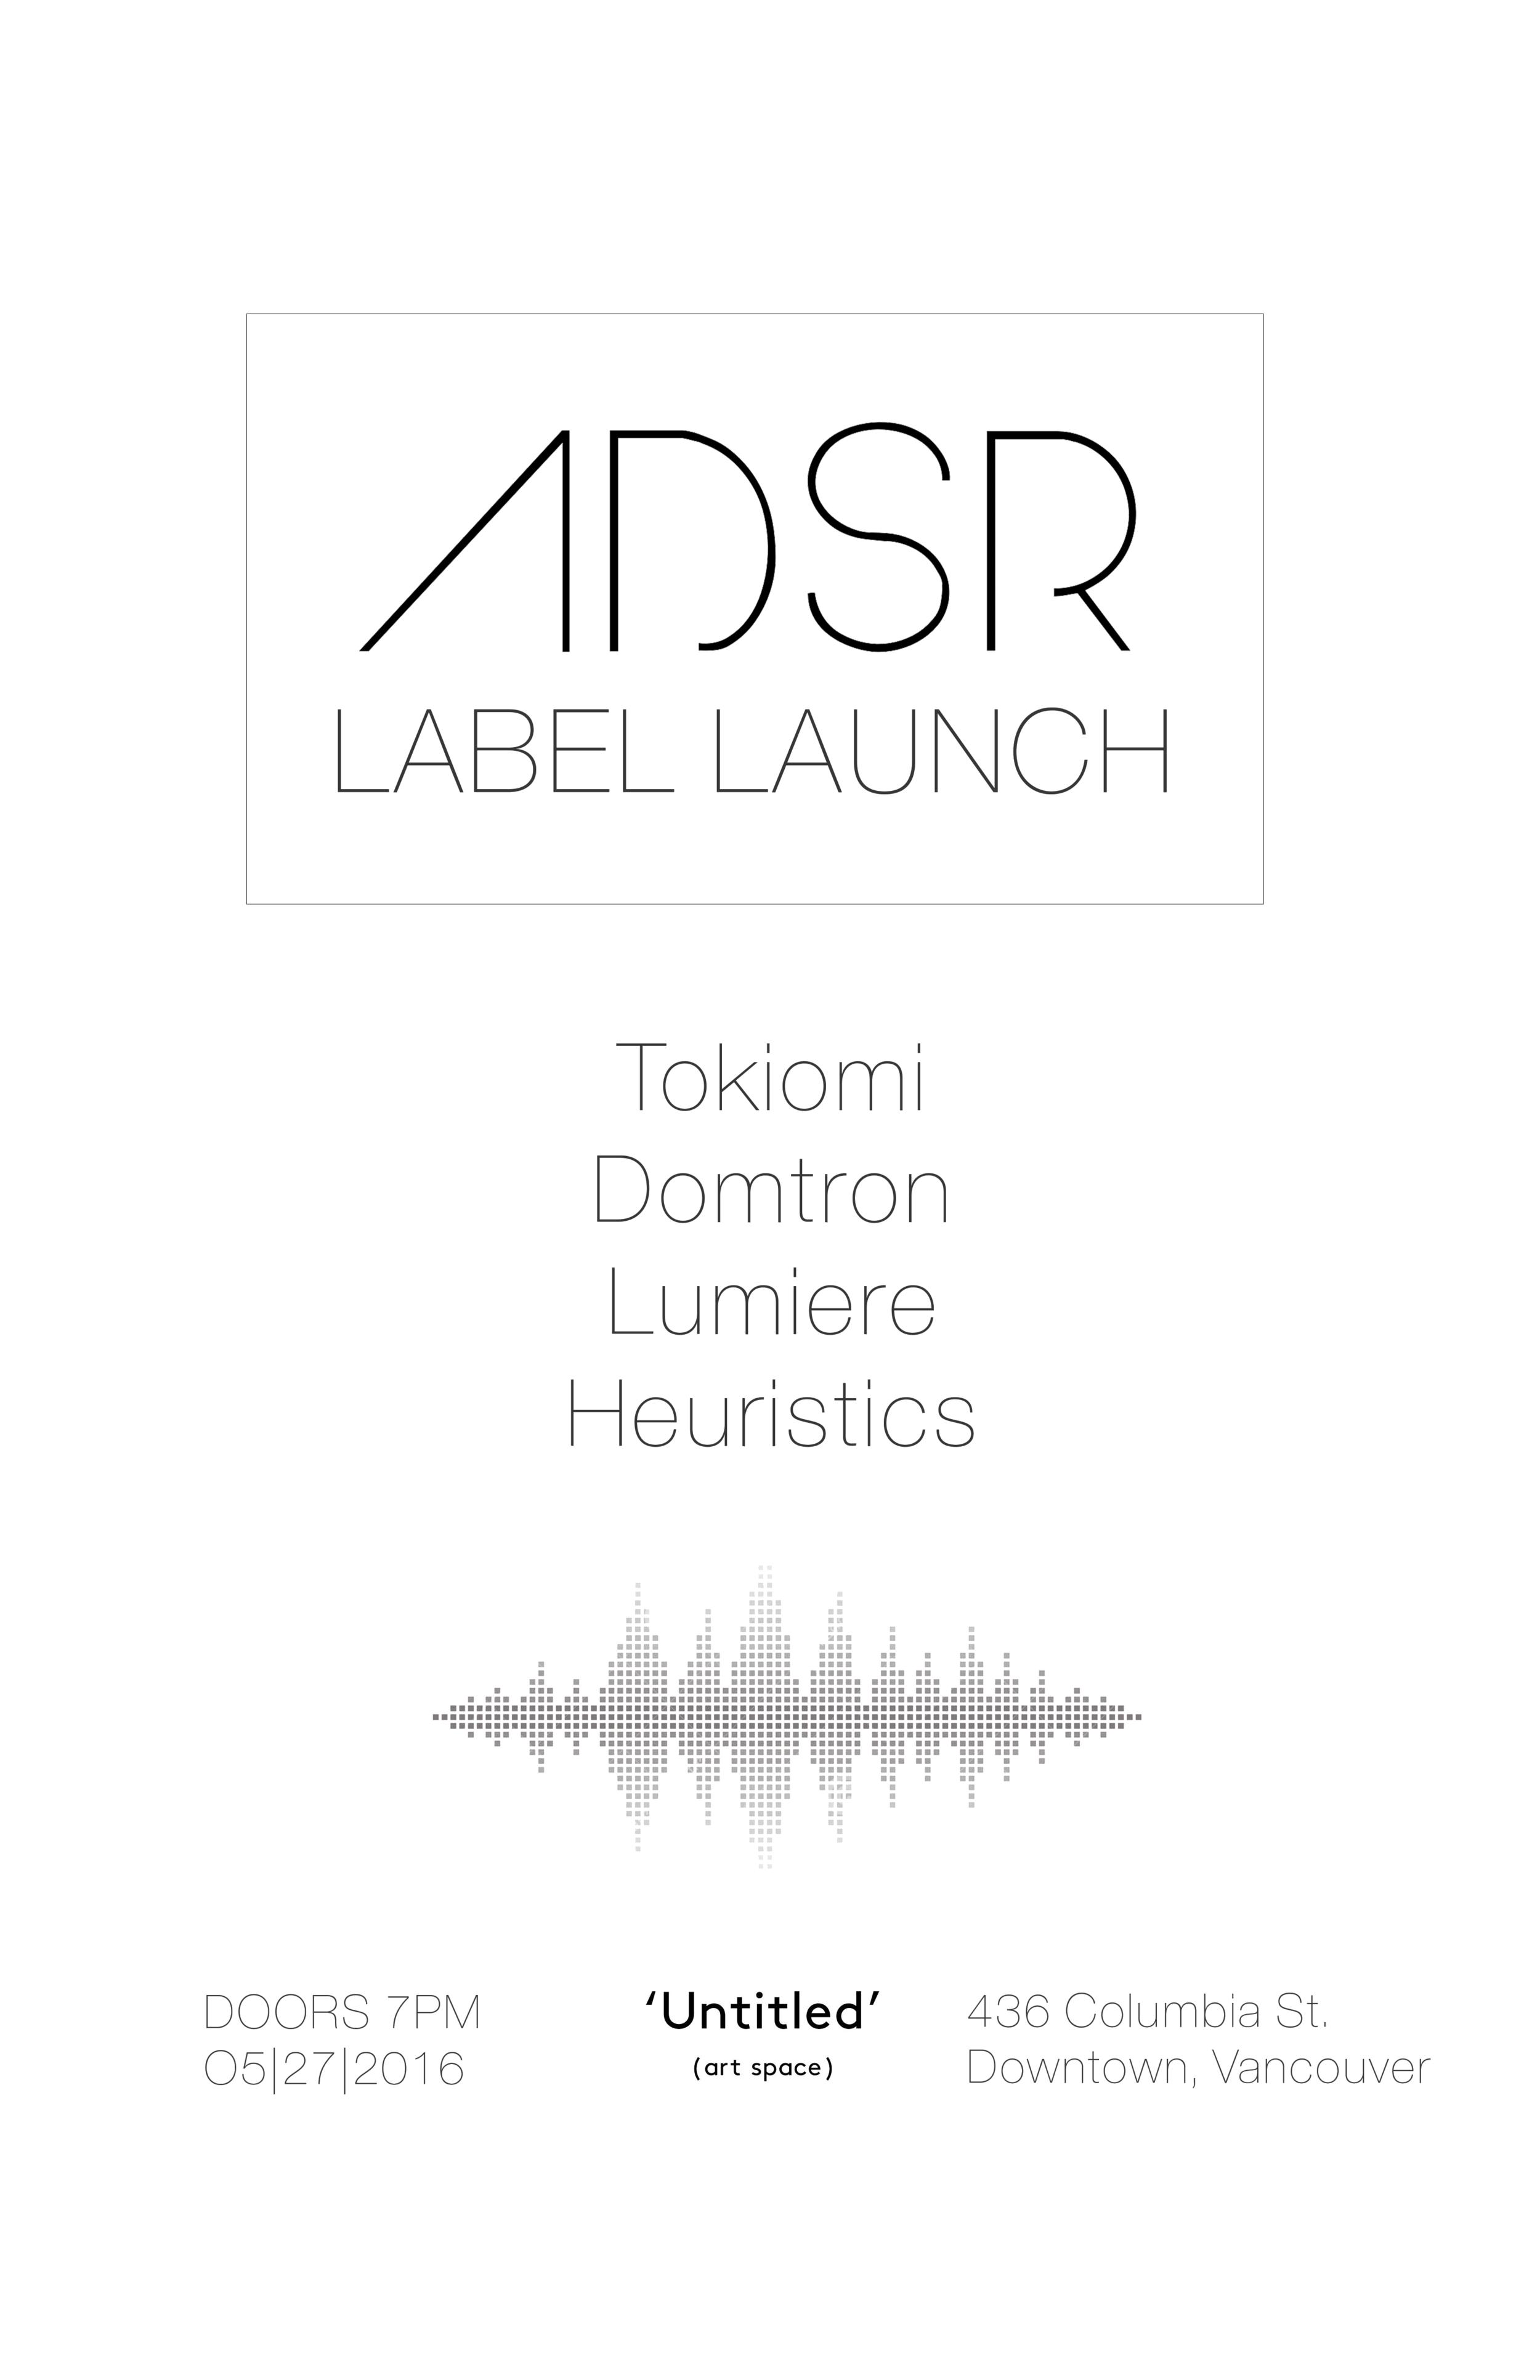 ADSR Label launch